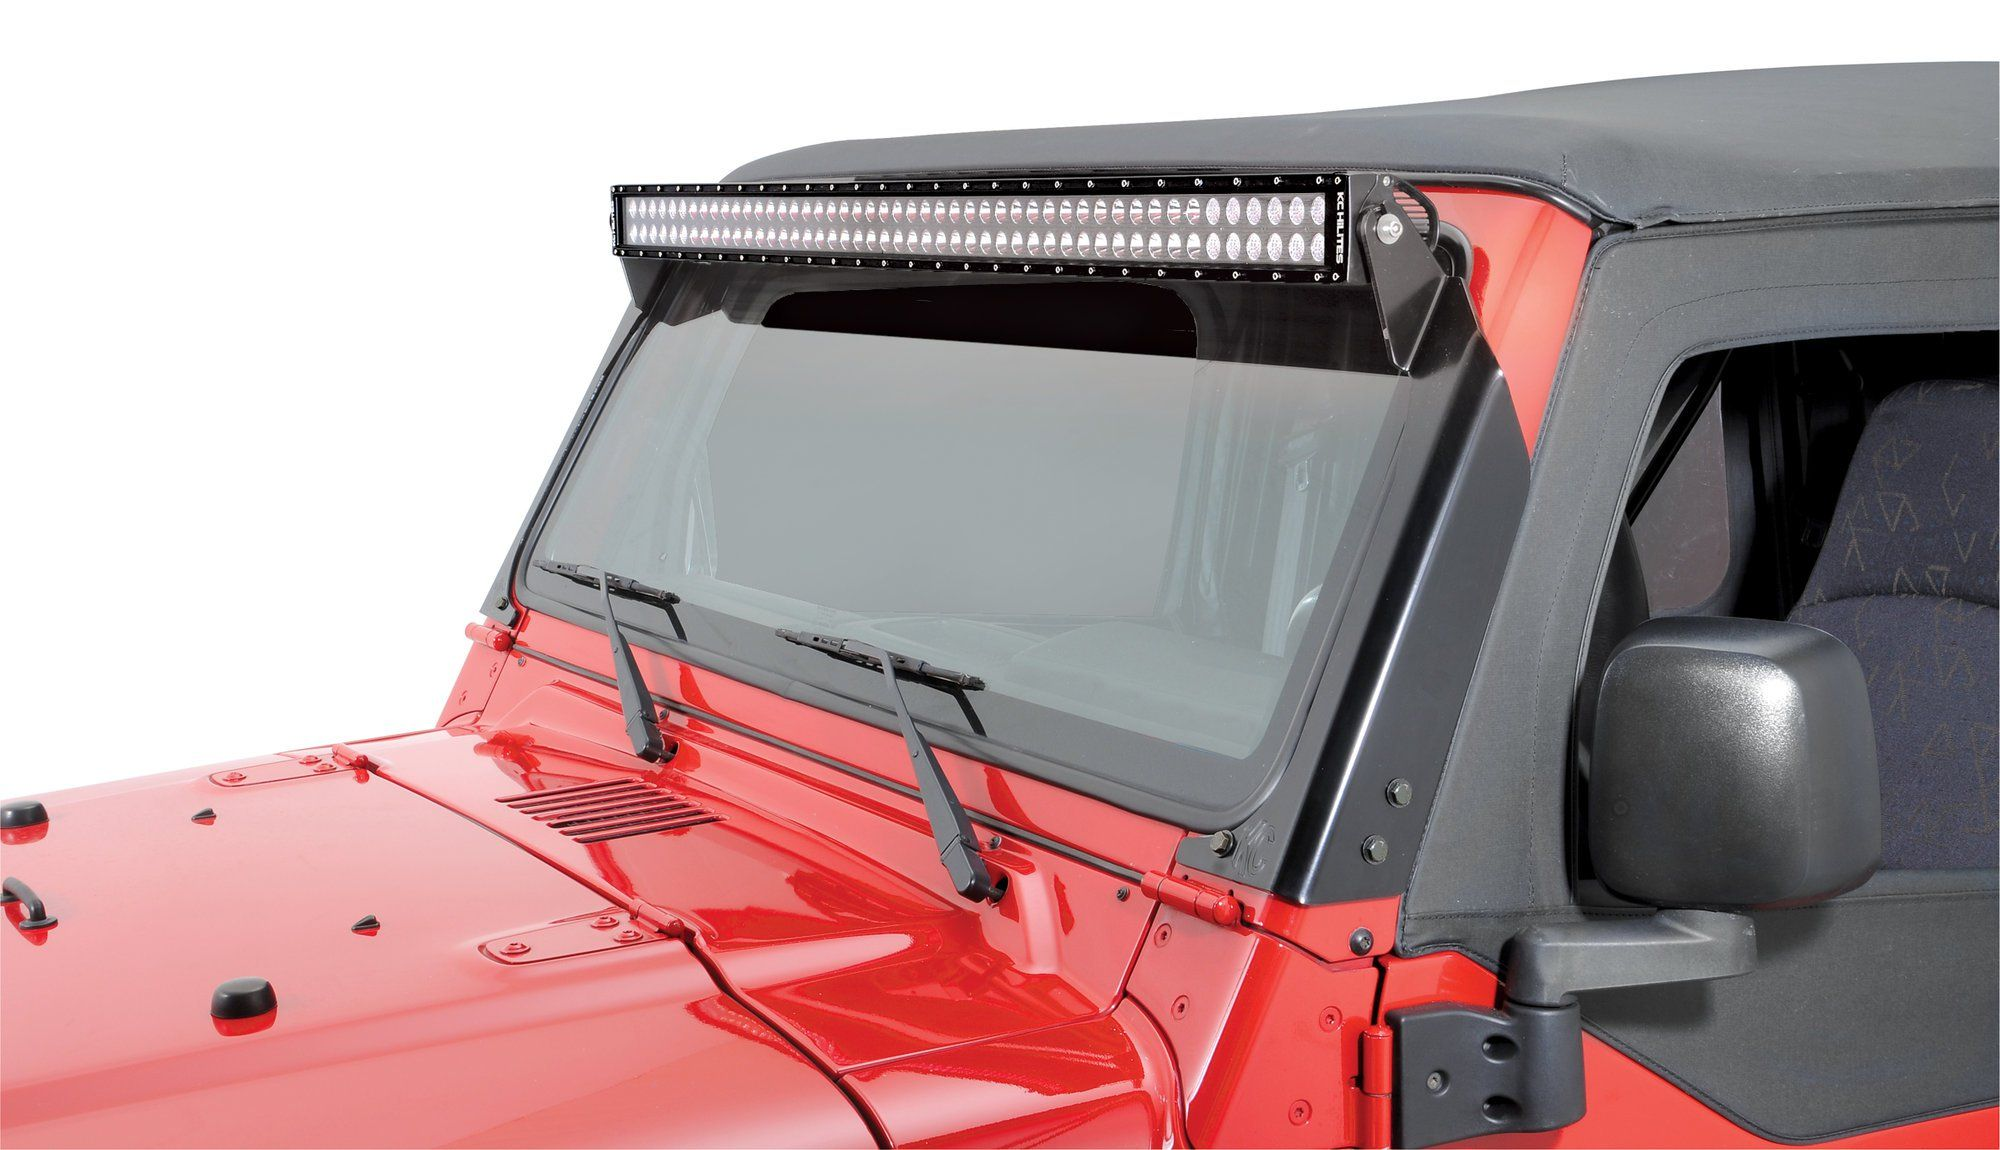 KC HiLiTES C LED bo Beam Light Bar with Harness